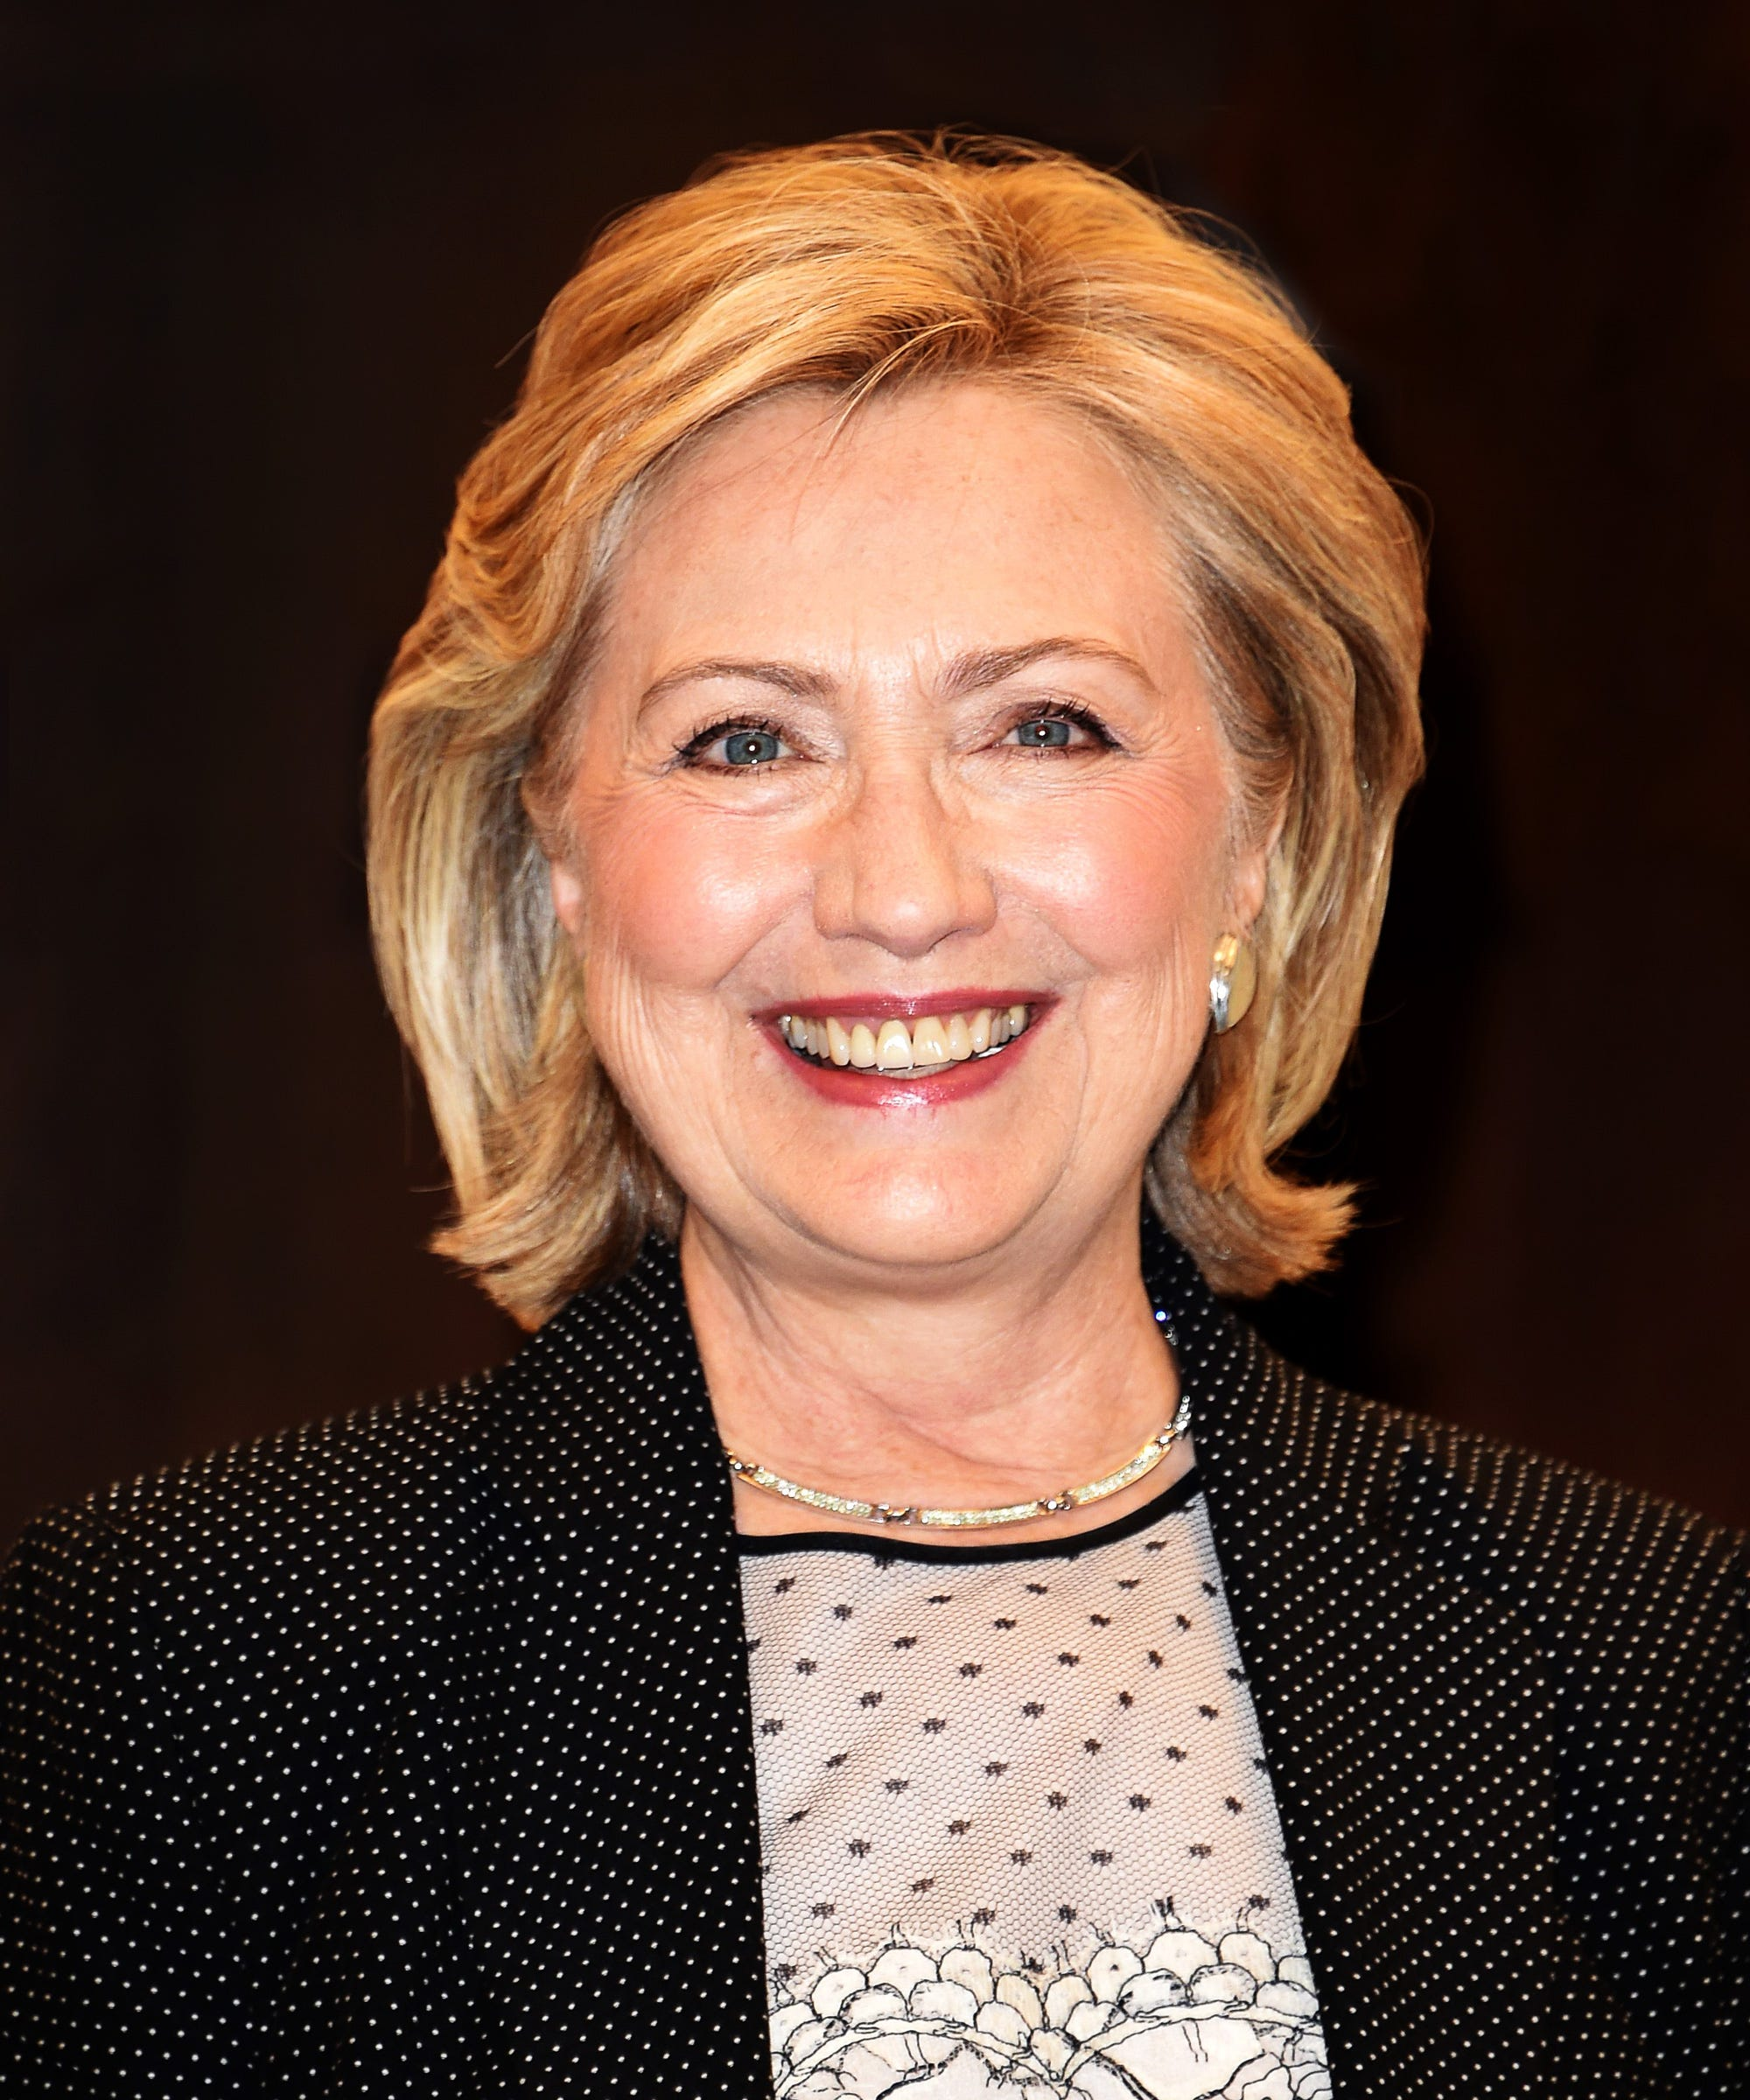 Donald Trump Hillary Clinton Hair Wig